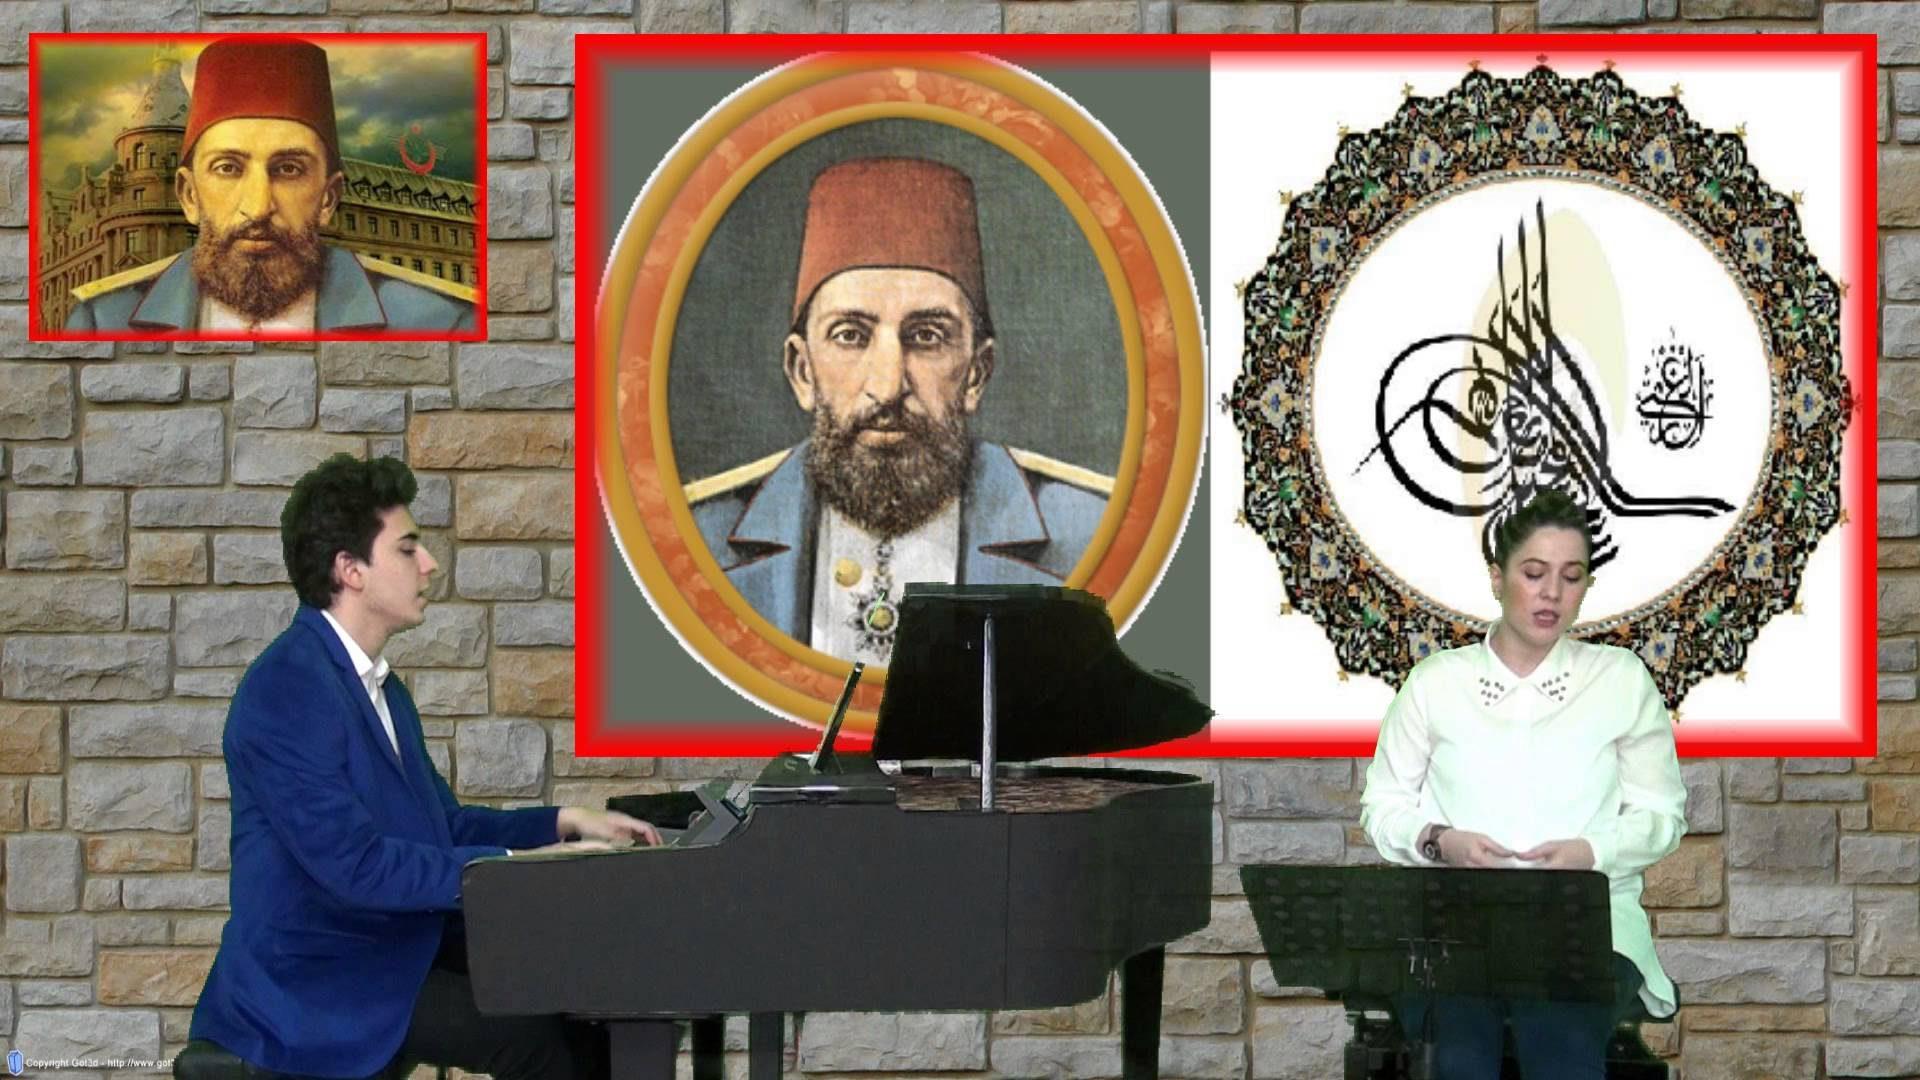 OSMANLI ALMAN MEHTER TAKIMI ABDÜLHAMİT HAN MARŞI